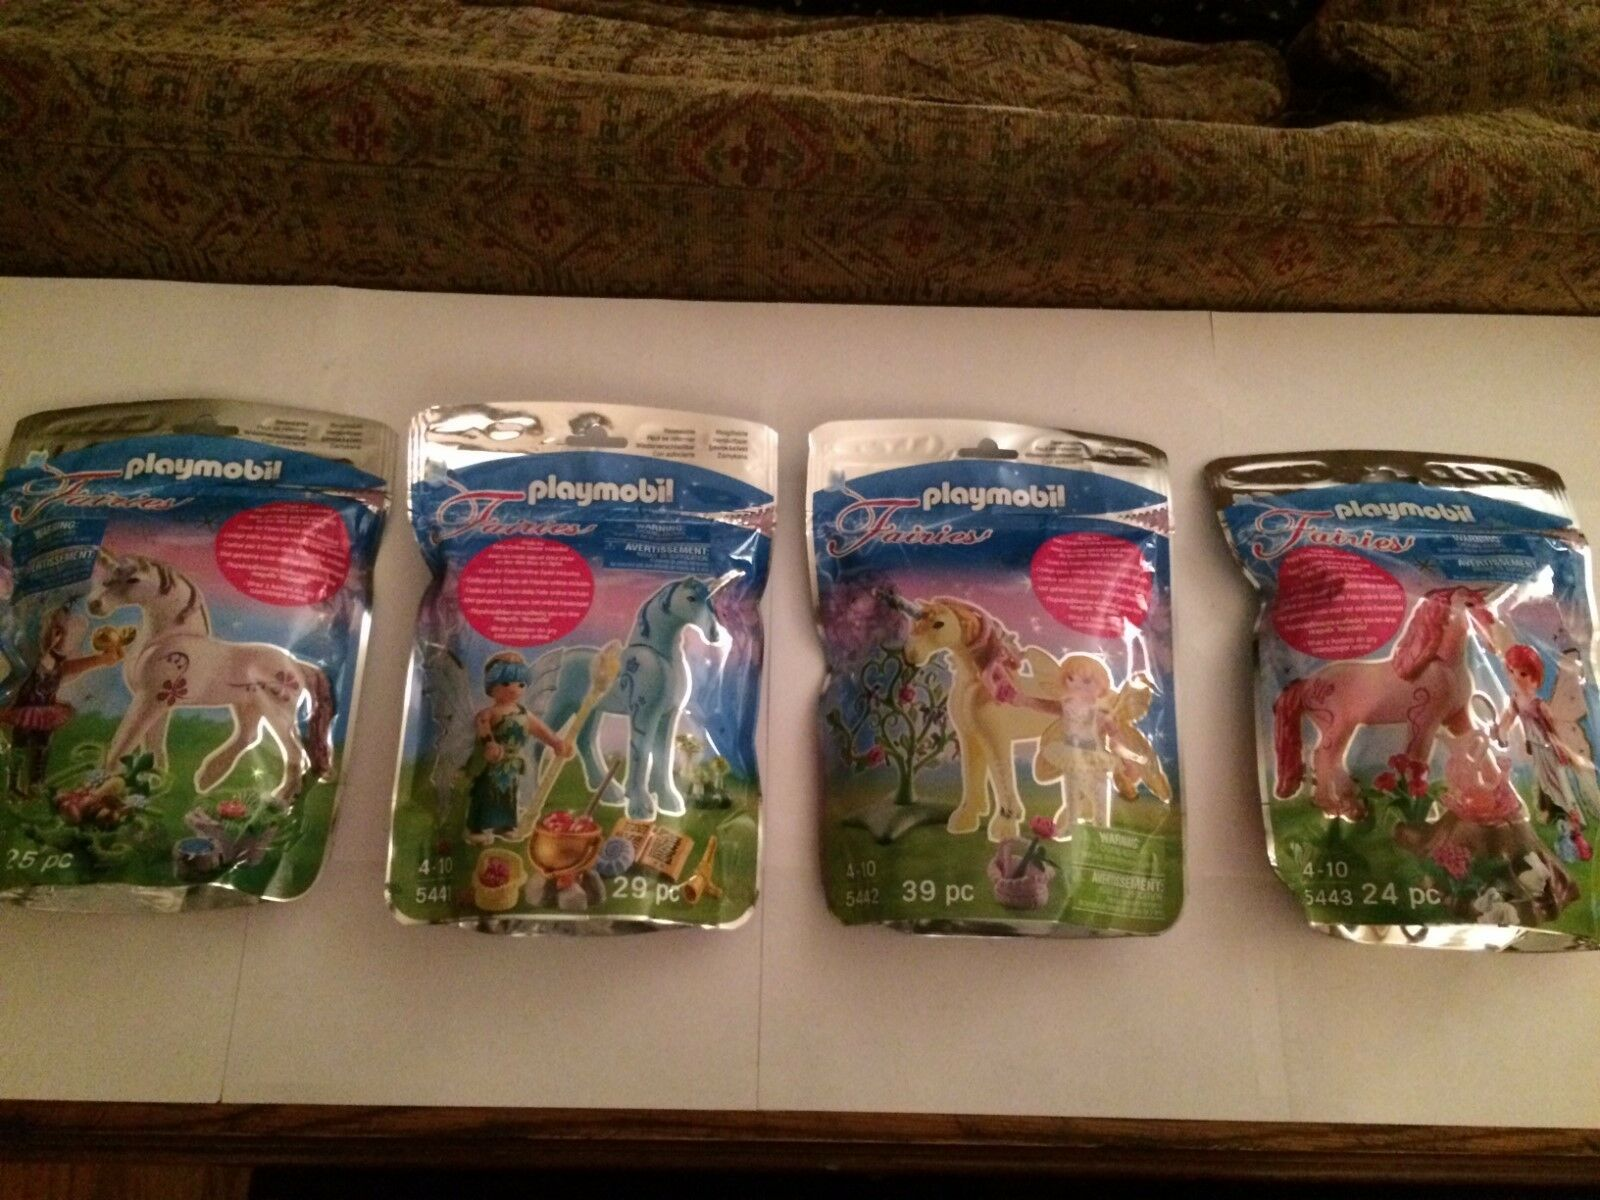 Playmobil Fairies Set tutti  4    5440, 5441, 5442, 5443 nuovo in Sealed borsas   senza esitazione! acquista ora!